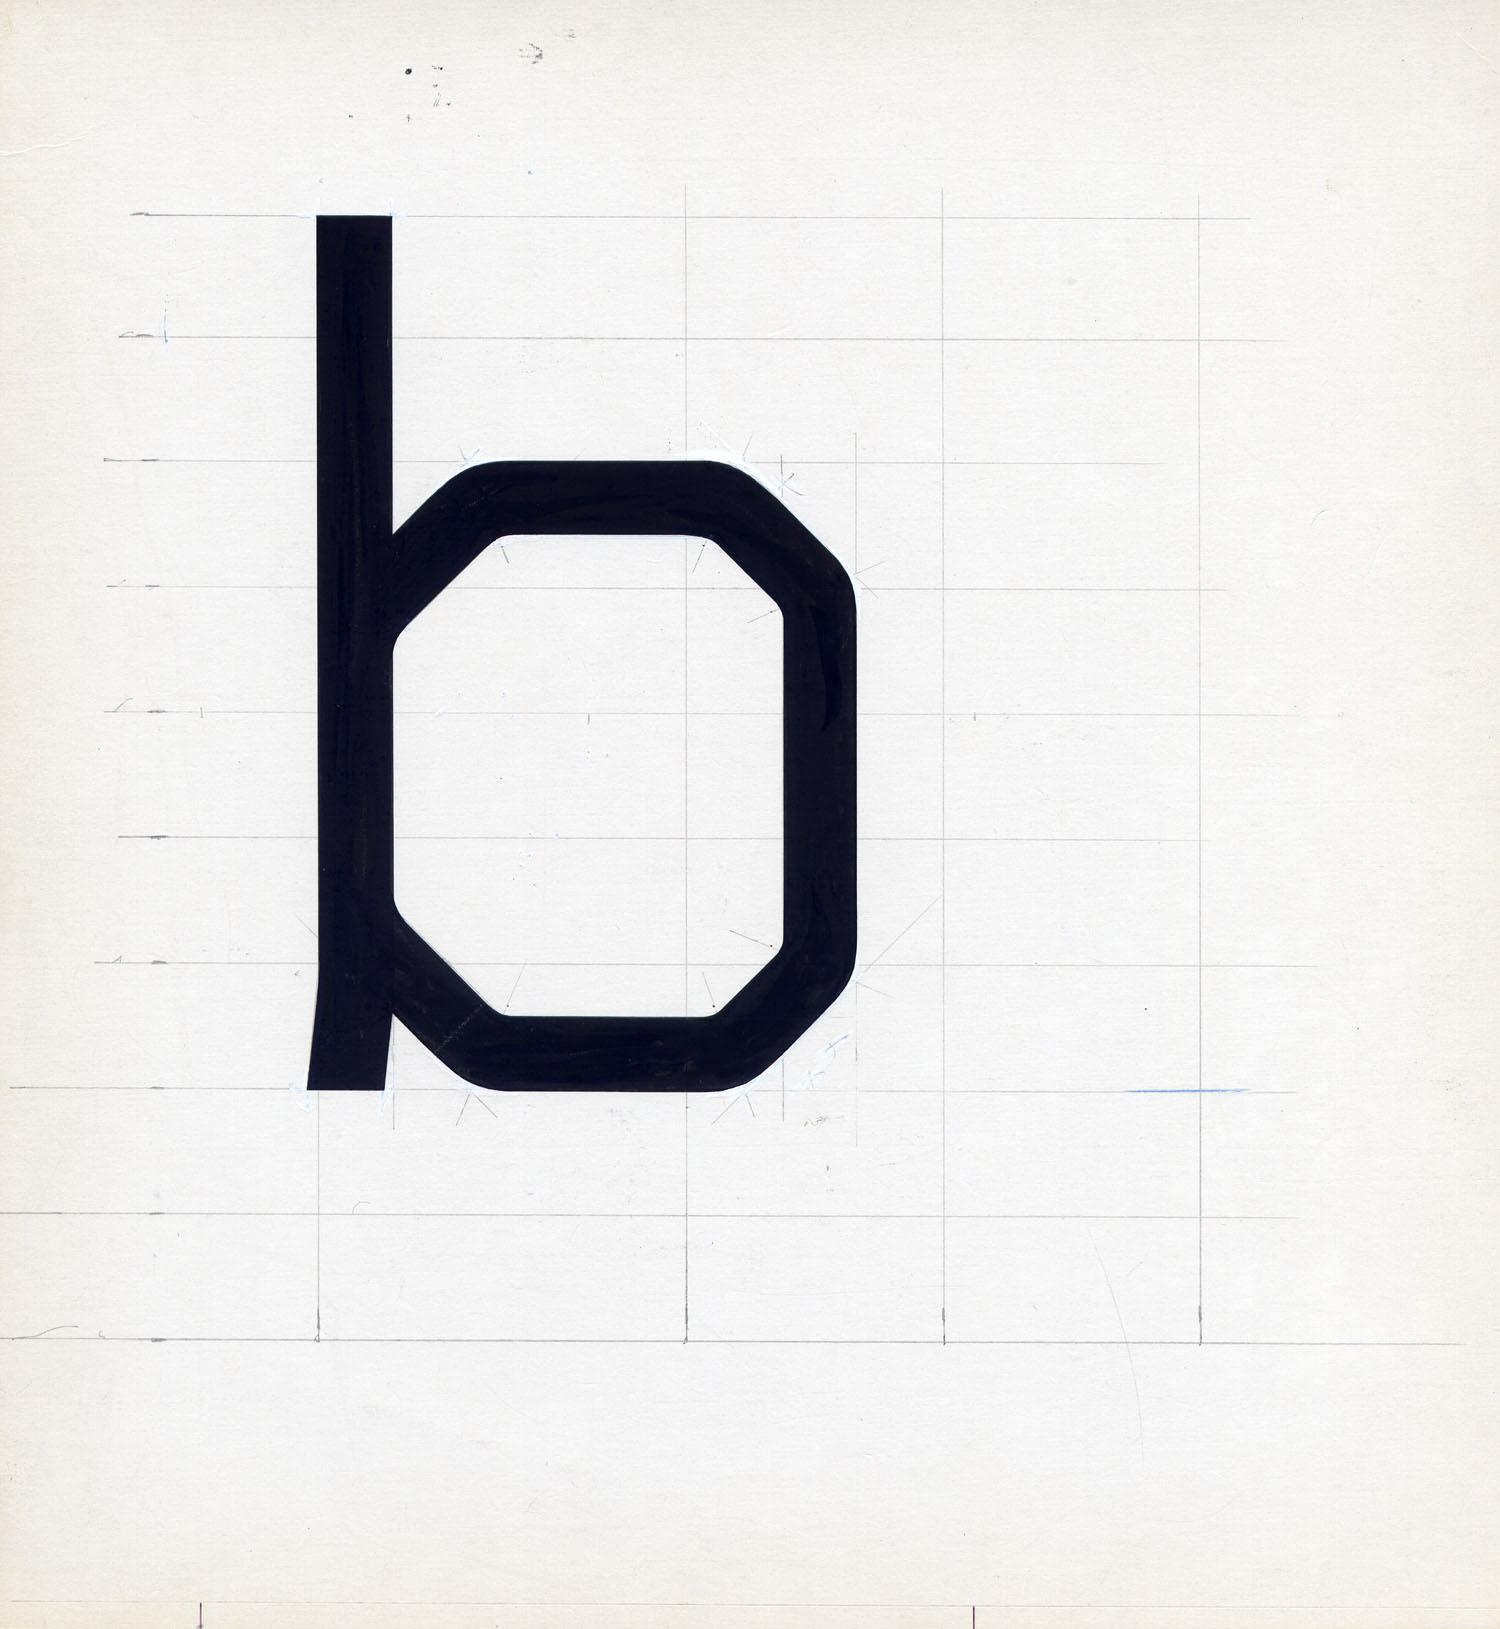 Wim Crouwel croquis typographie Gridnik 1967